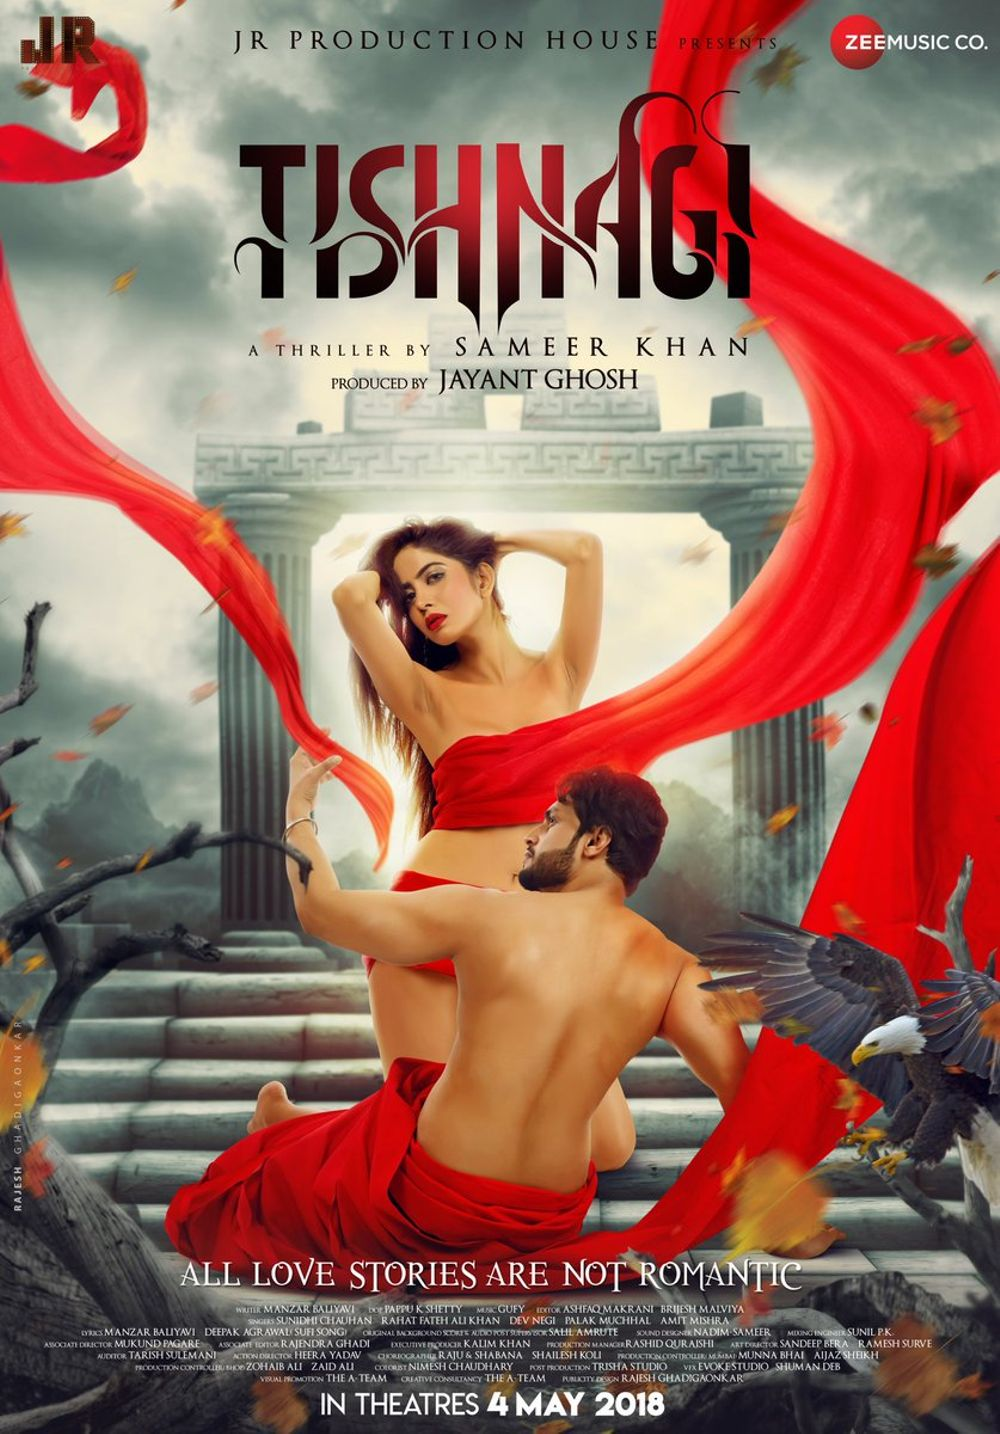 Tishnagi Movie Review